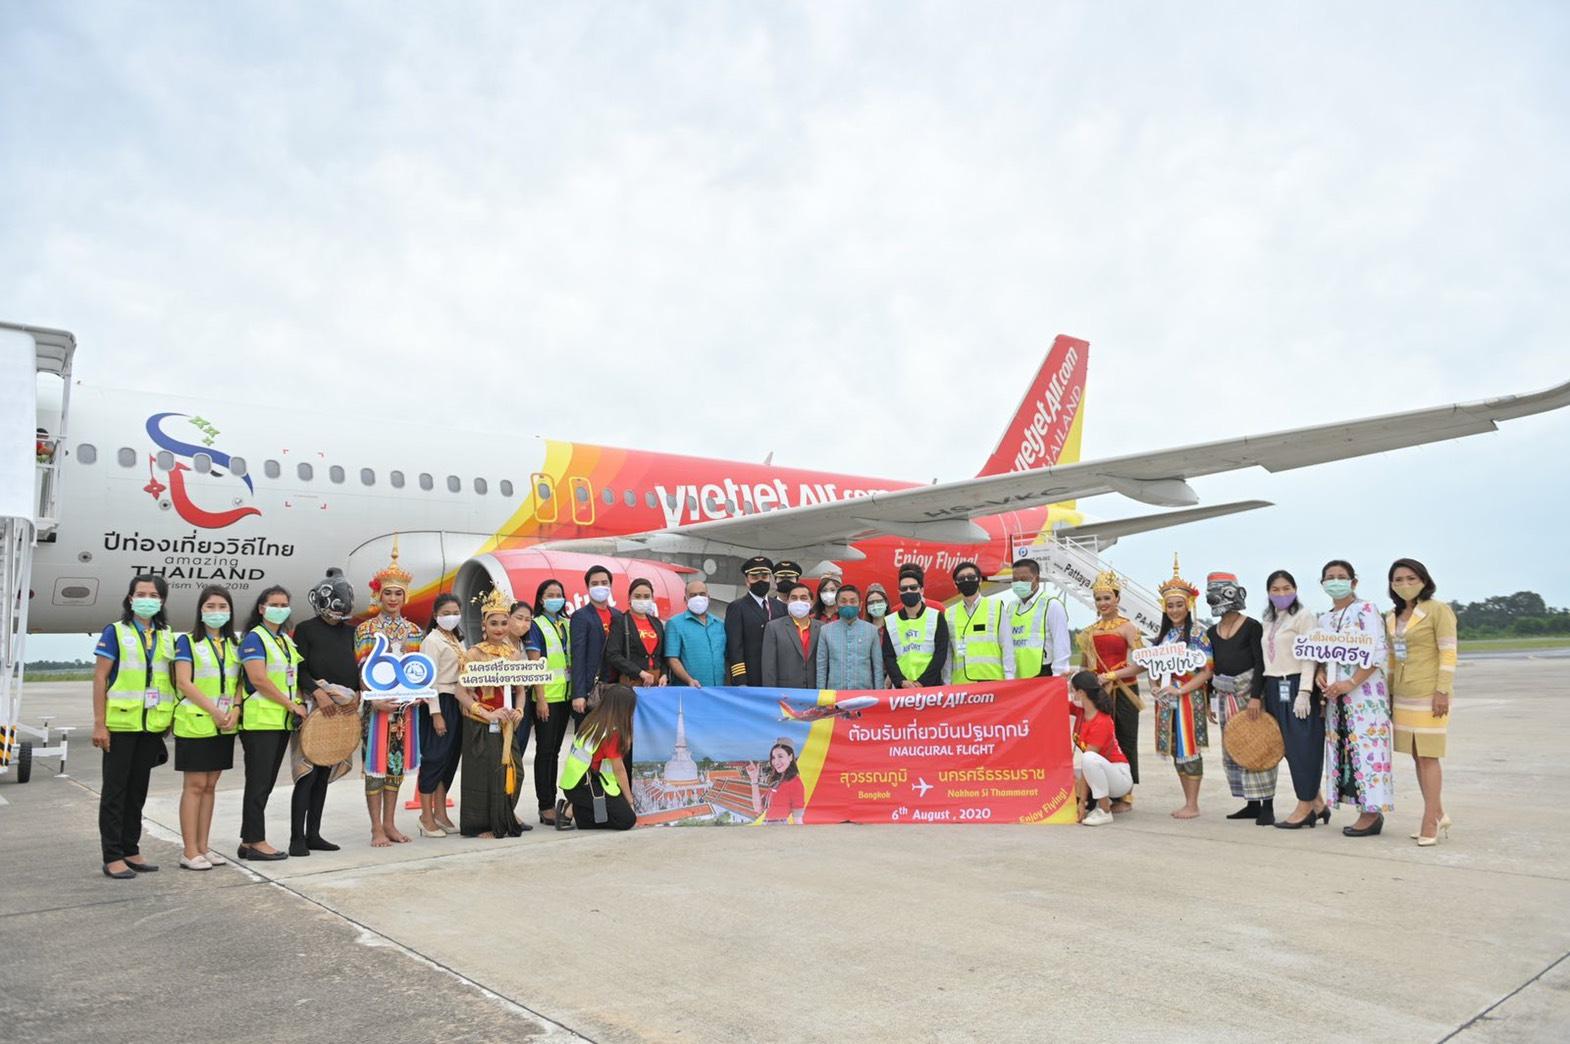 Thai Vietjet commences 10th domestic service in Thailand, linking Bangkok and Nakhon Si Thammarat